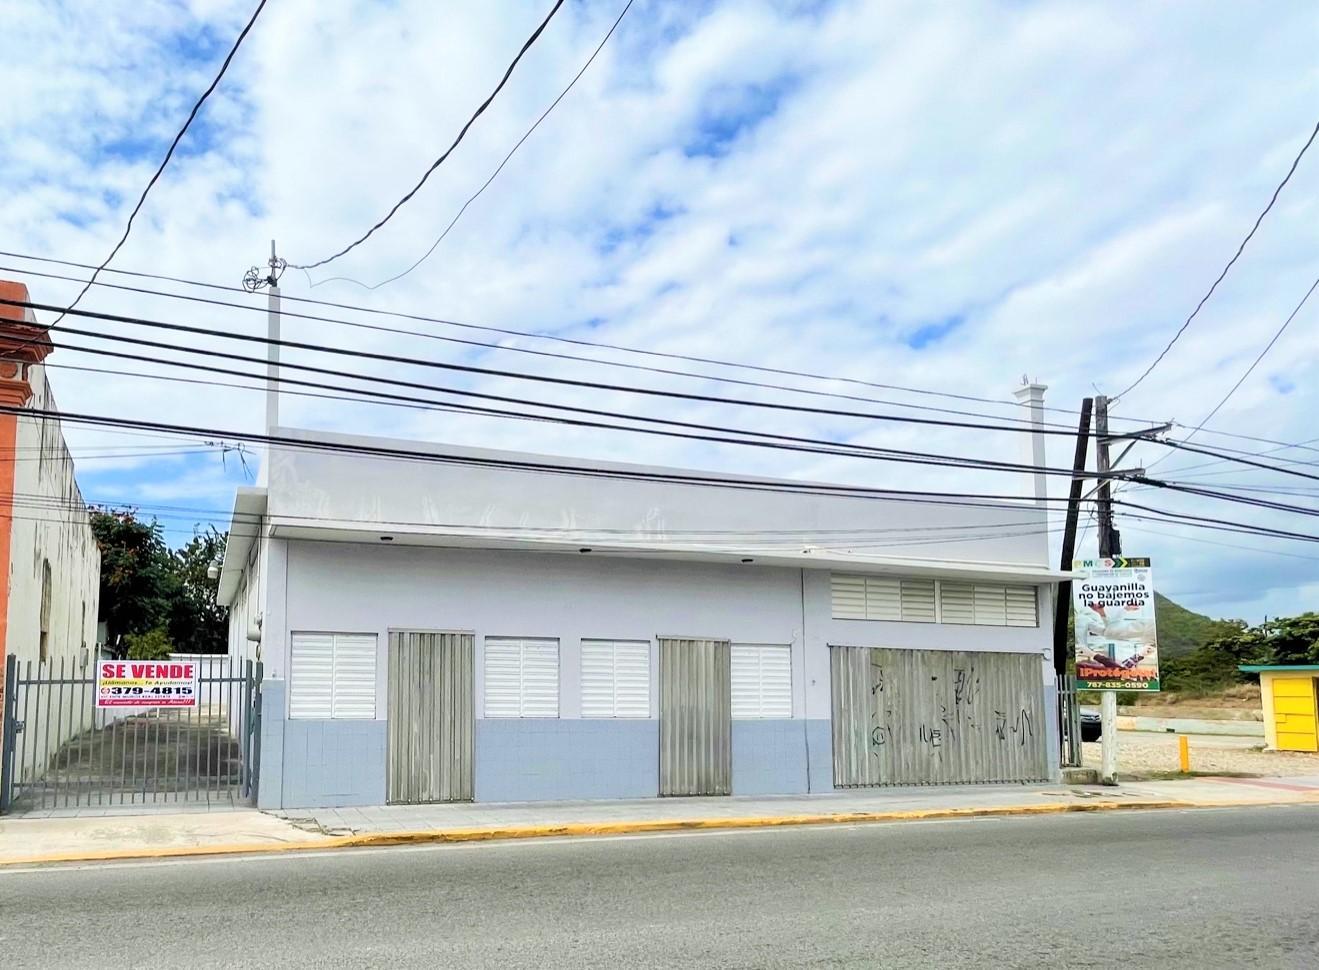 Calle Luis Muñoz Rivera 64 Guayanilla, PR 00656